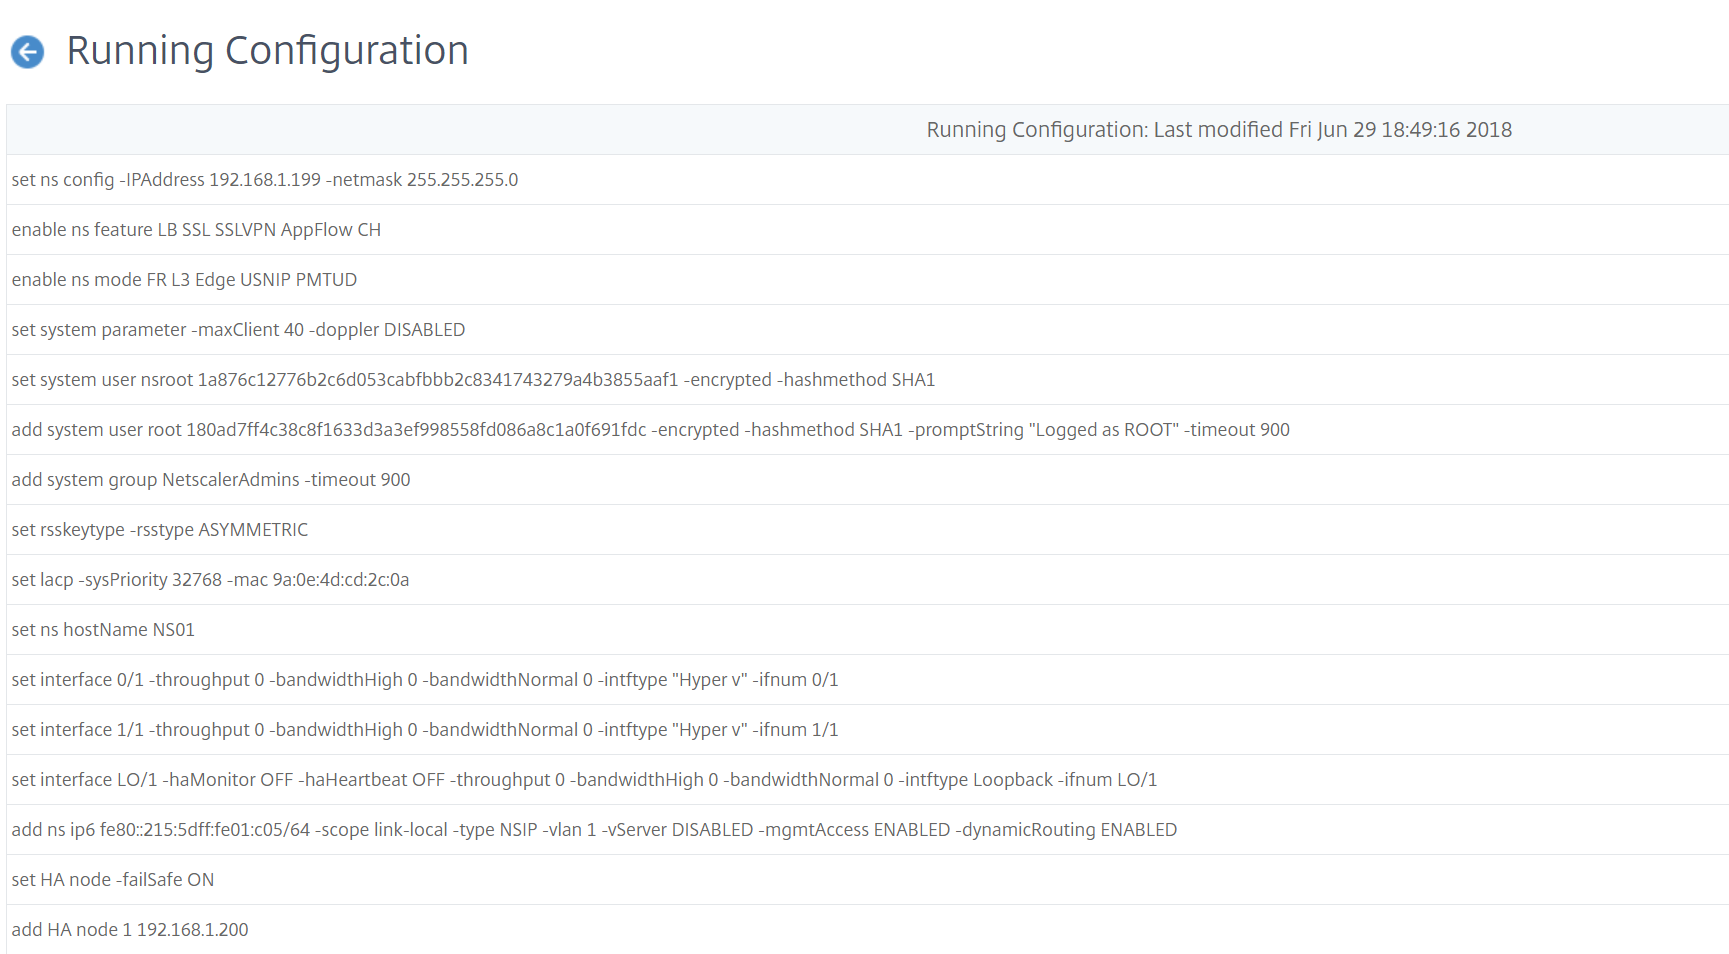 Citrix Management and Analytics Service - Running configuration